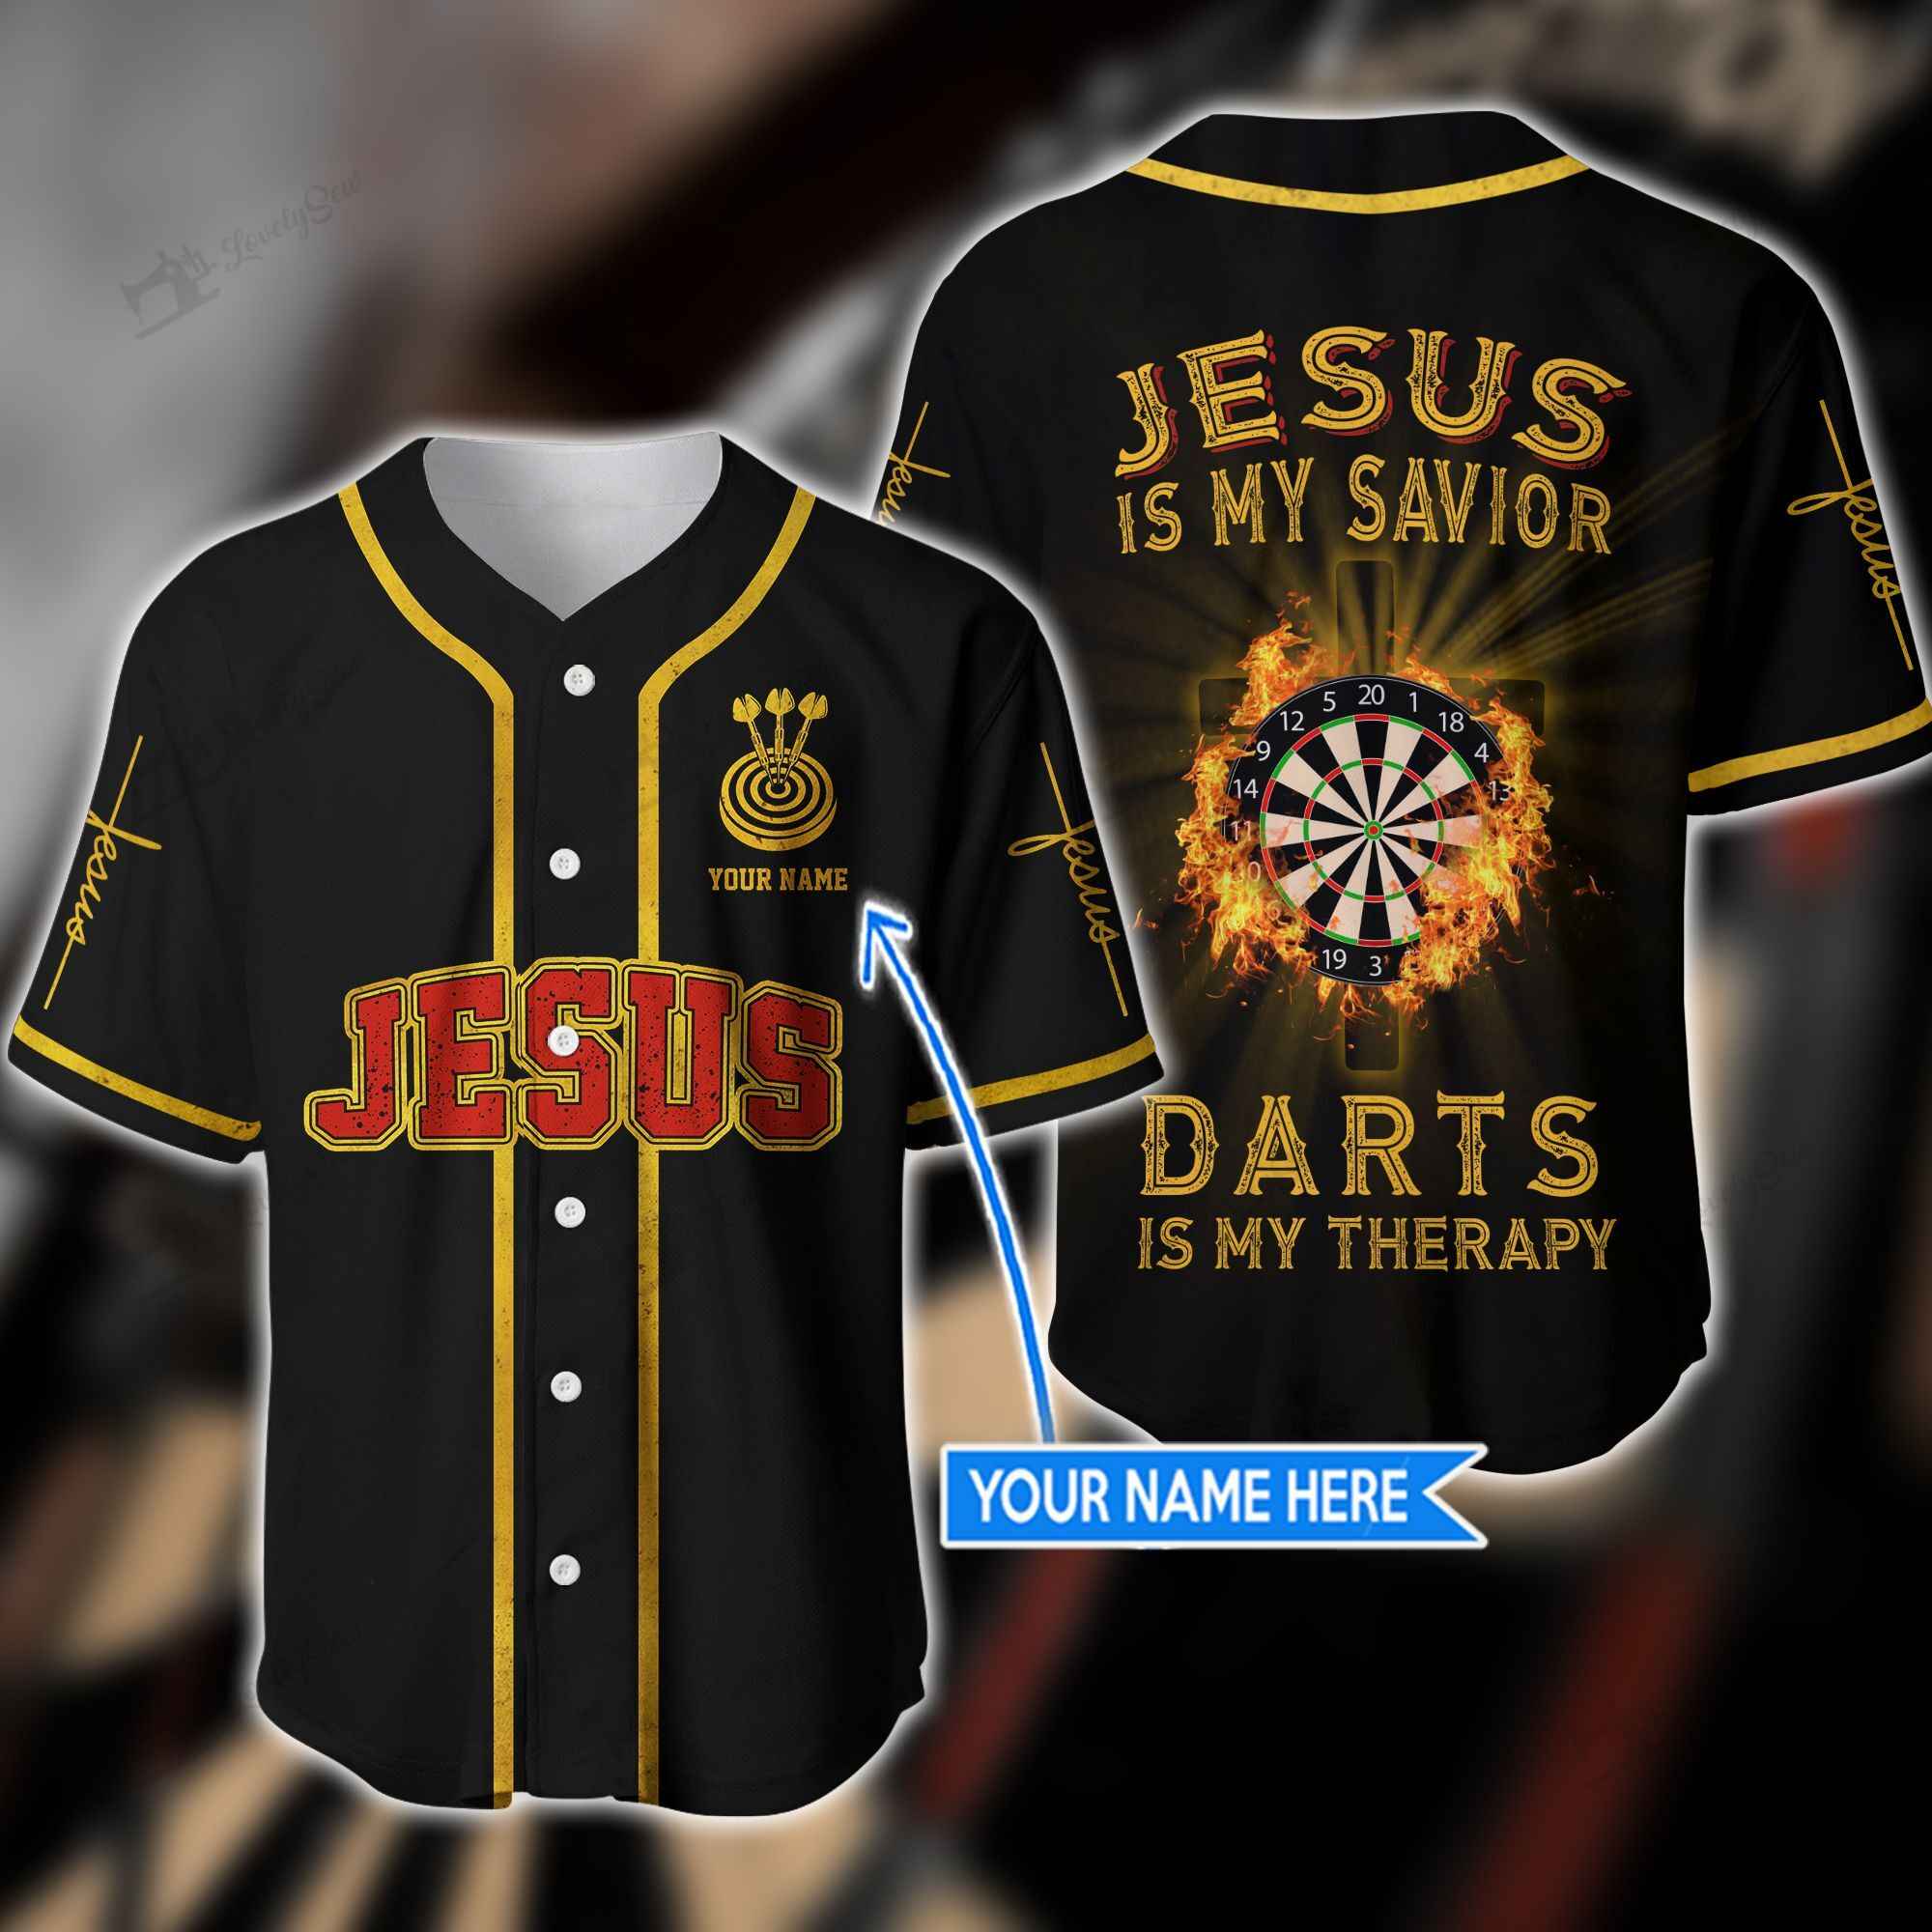 Jesus is my savior darts is my therapy custom name baseball shirt